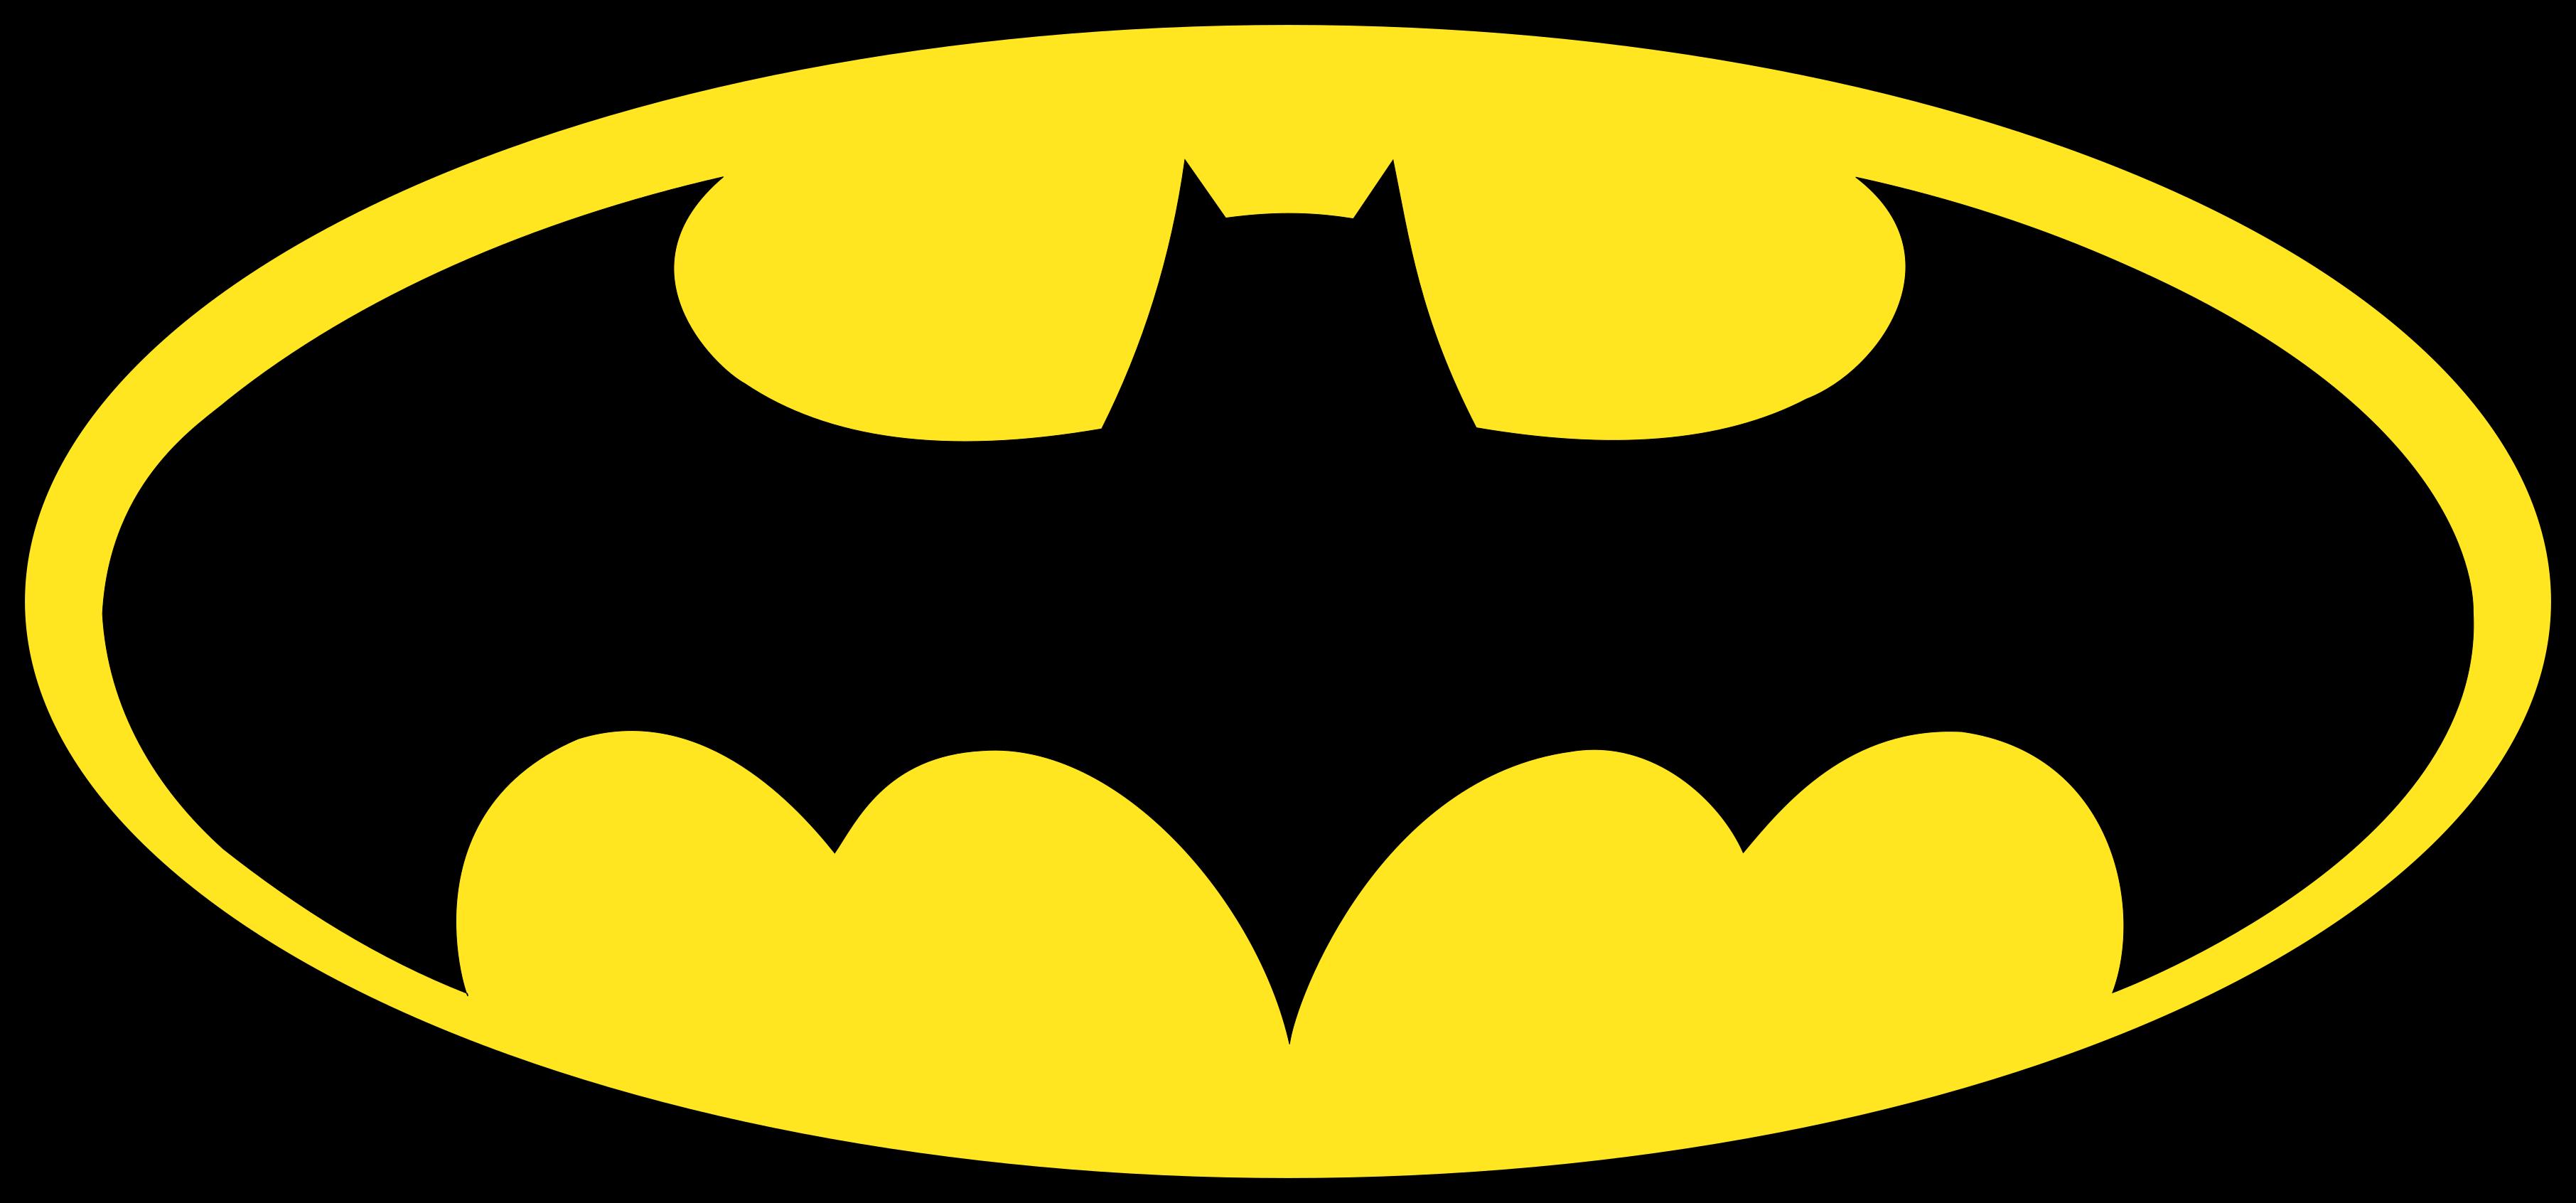 Batman Logo Png - Free Transparent PNG Logos